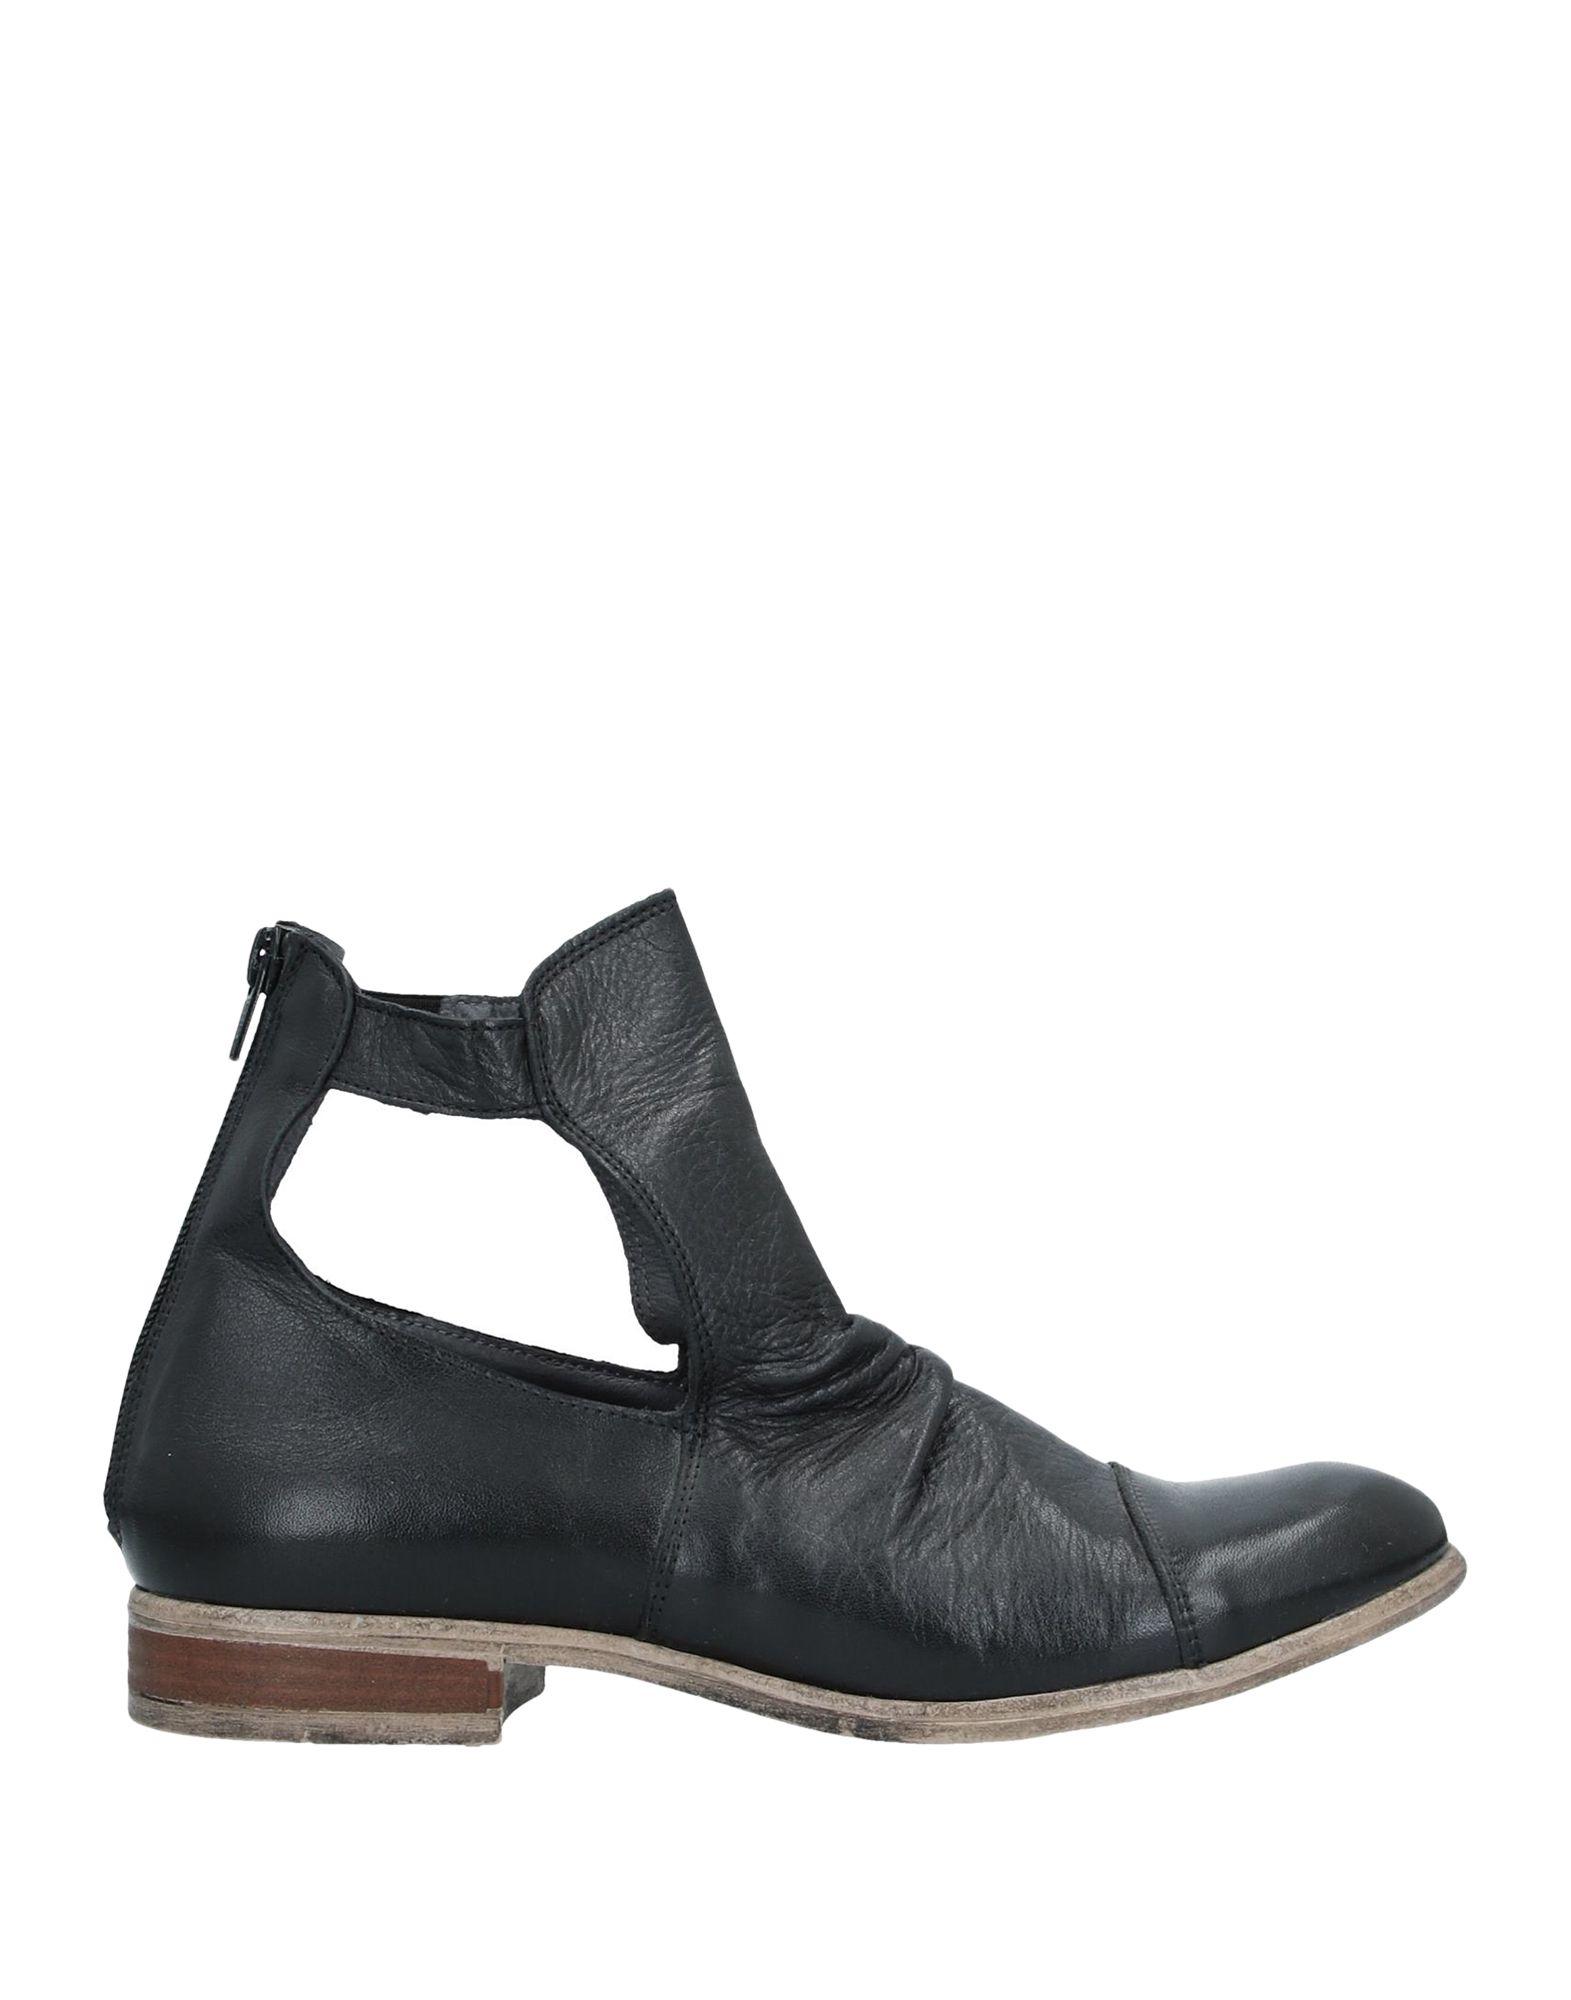 Фото - LE BOHÉMIEN Полусапоги и высокие ботинки le bohémien вьетнамки